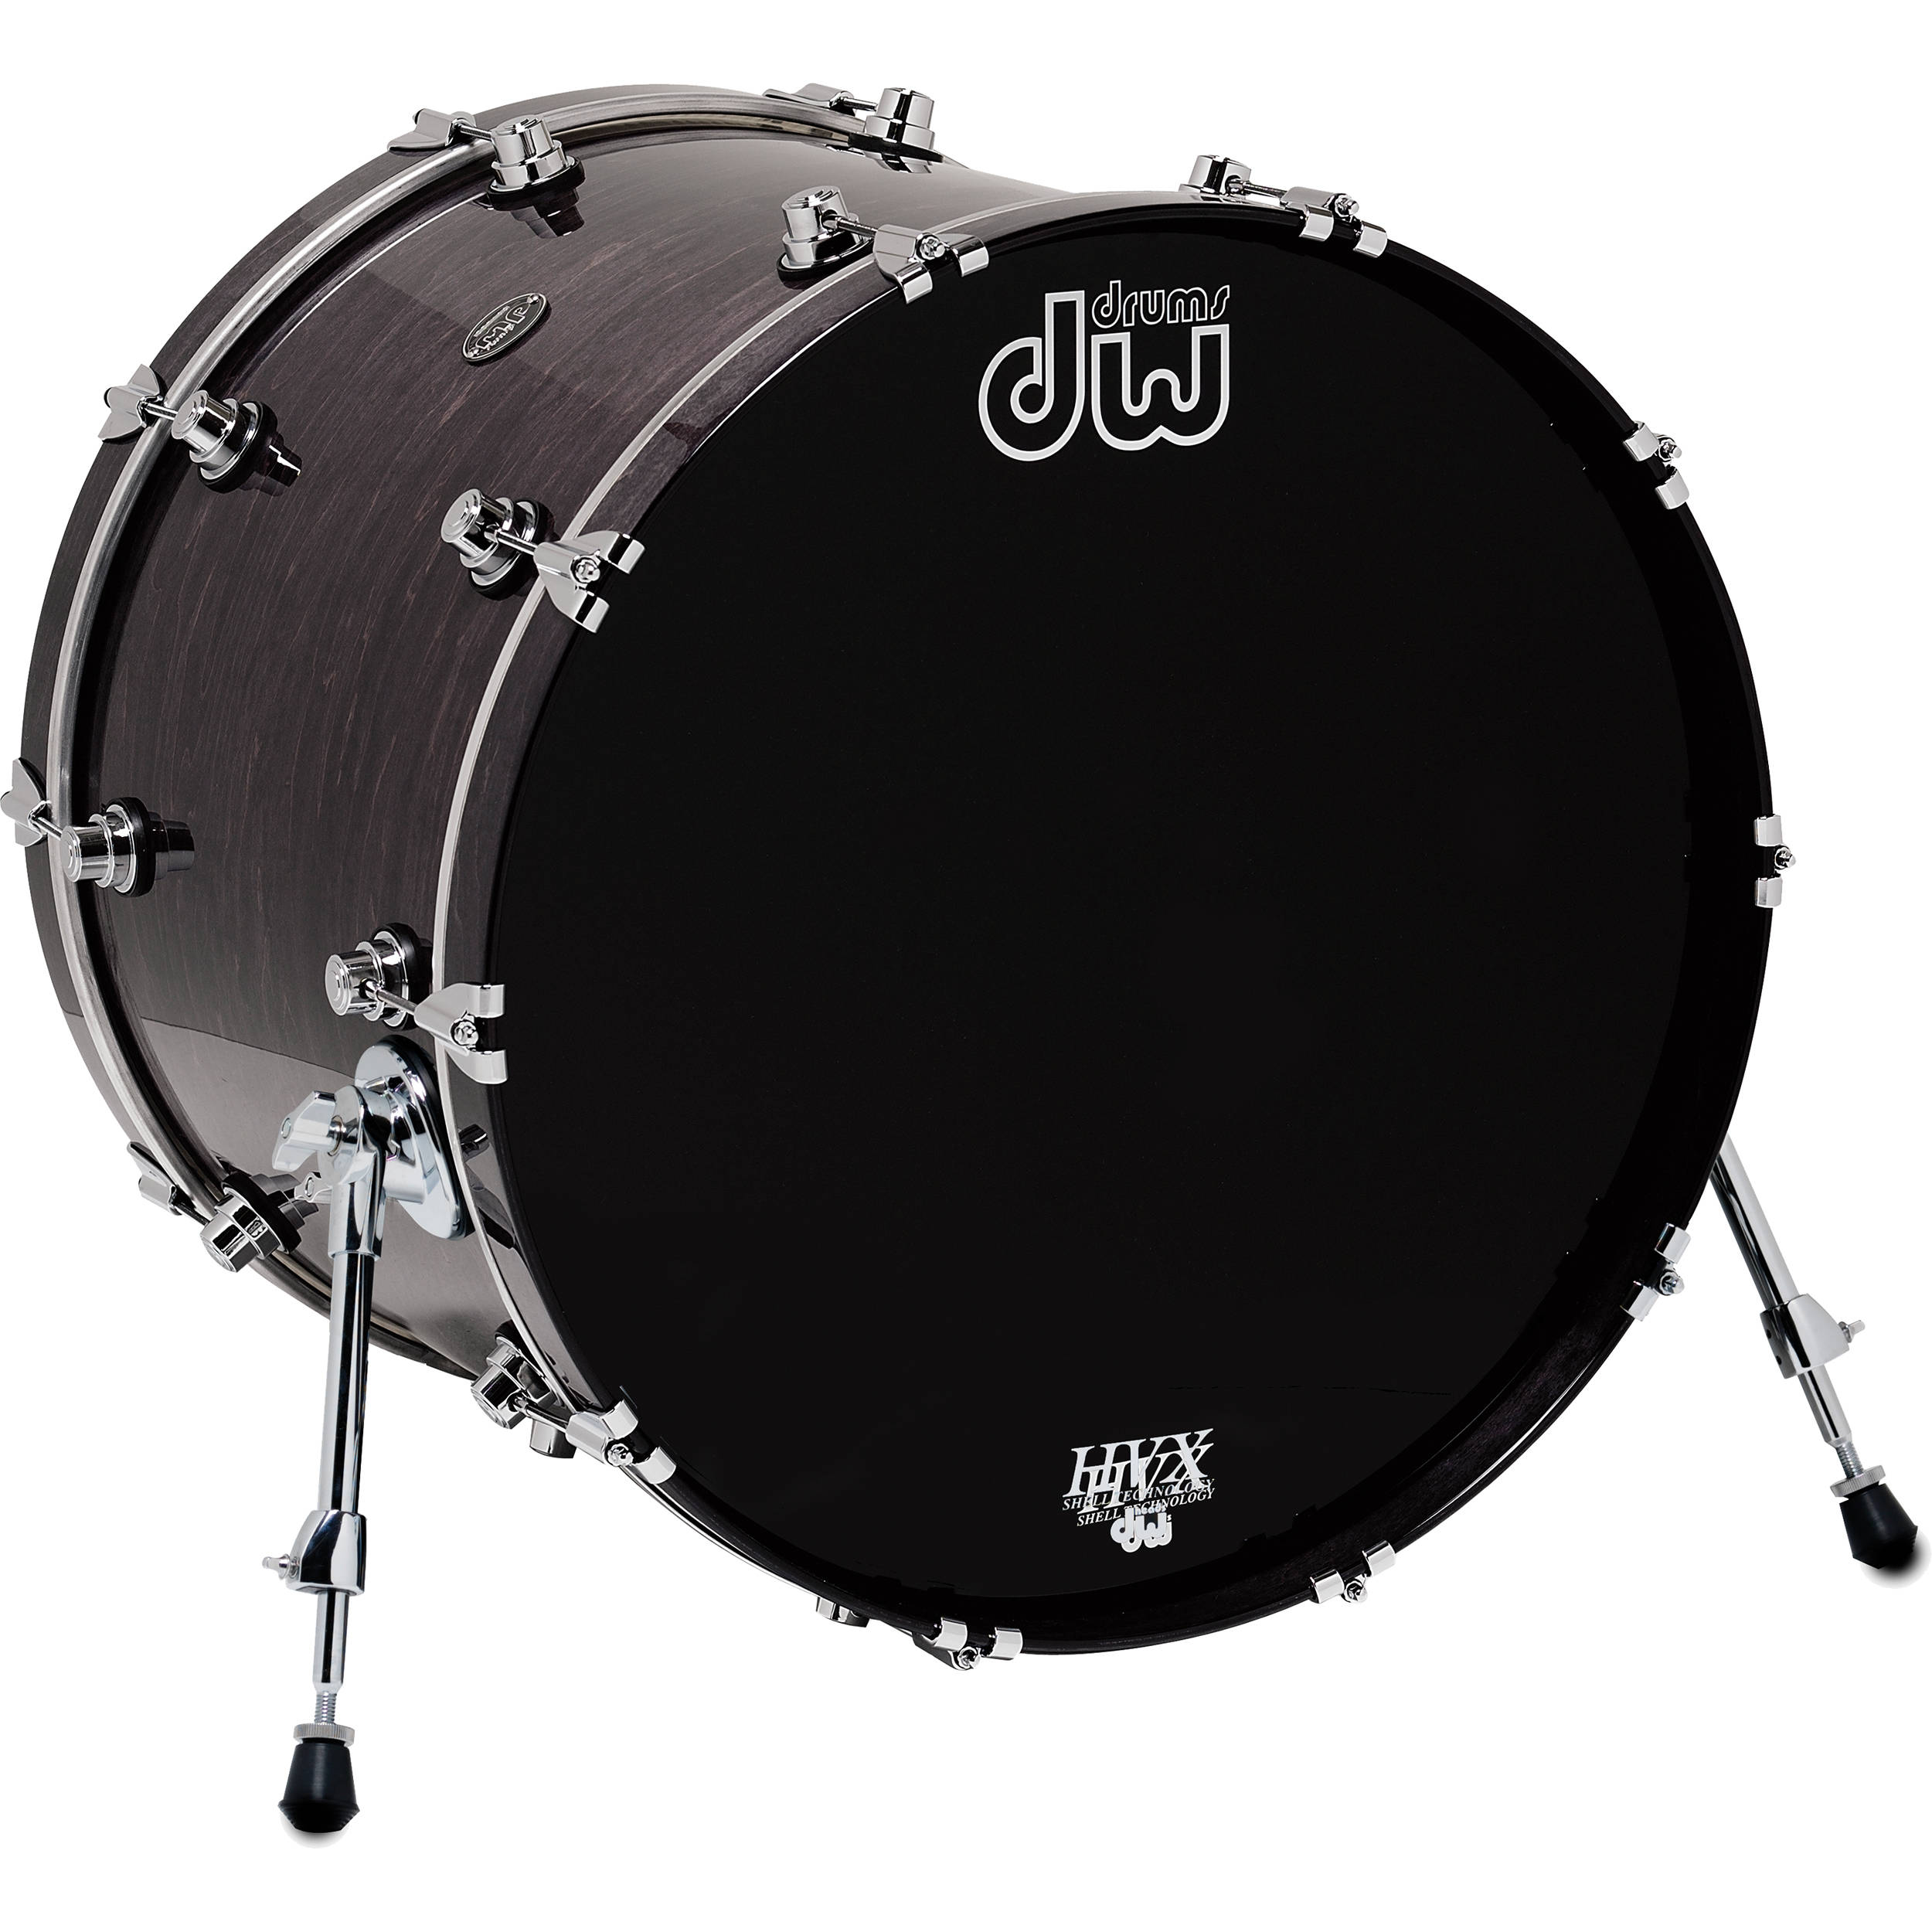 dw drums performance series 18 x 22 kick drpl1822kkes. Black Bedroom Furniture Sets. Home Design Ideas